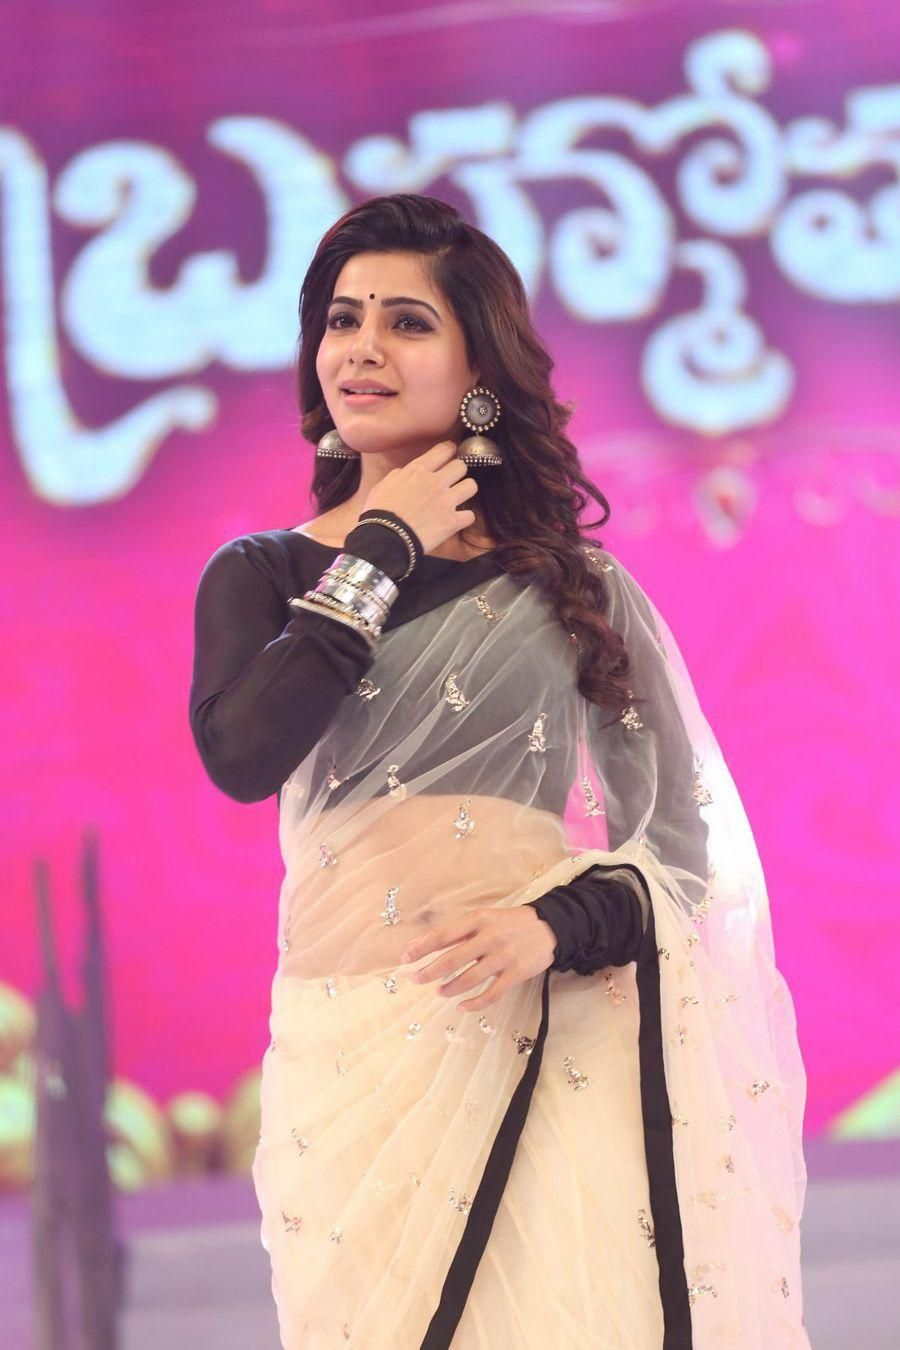 323eb9f8edff6d White saree, Transparent saree, Black borders, Black full sleeves blouse,  Love the jumka, Samantha Ruth Prabhu looking gorgeous in this beautiful  saree